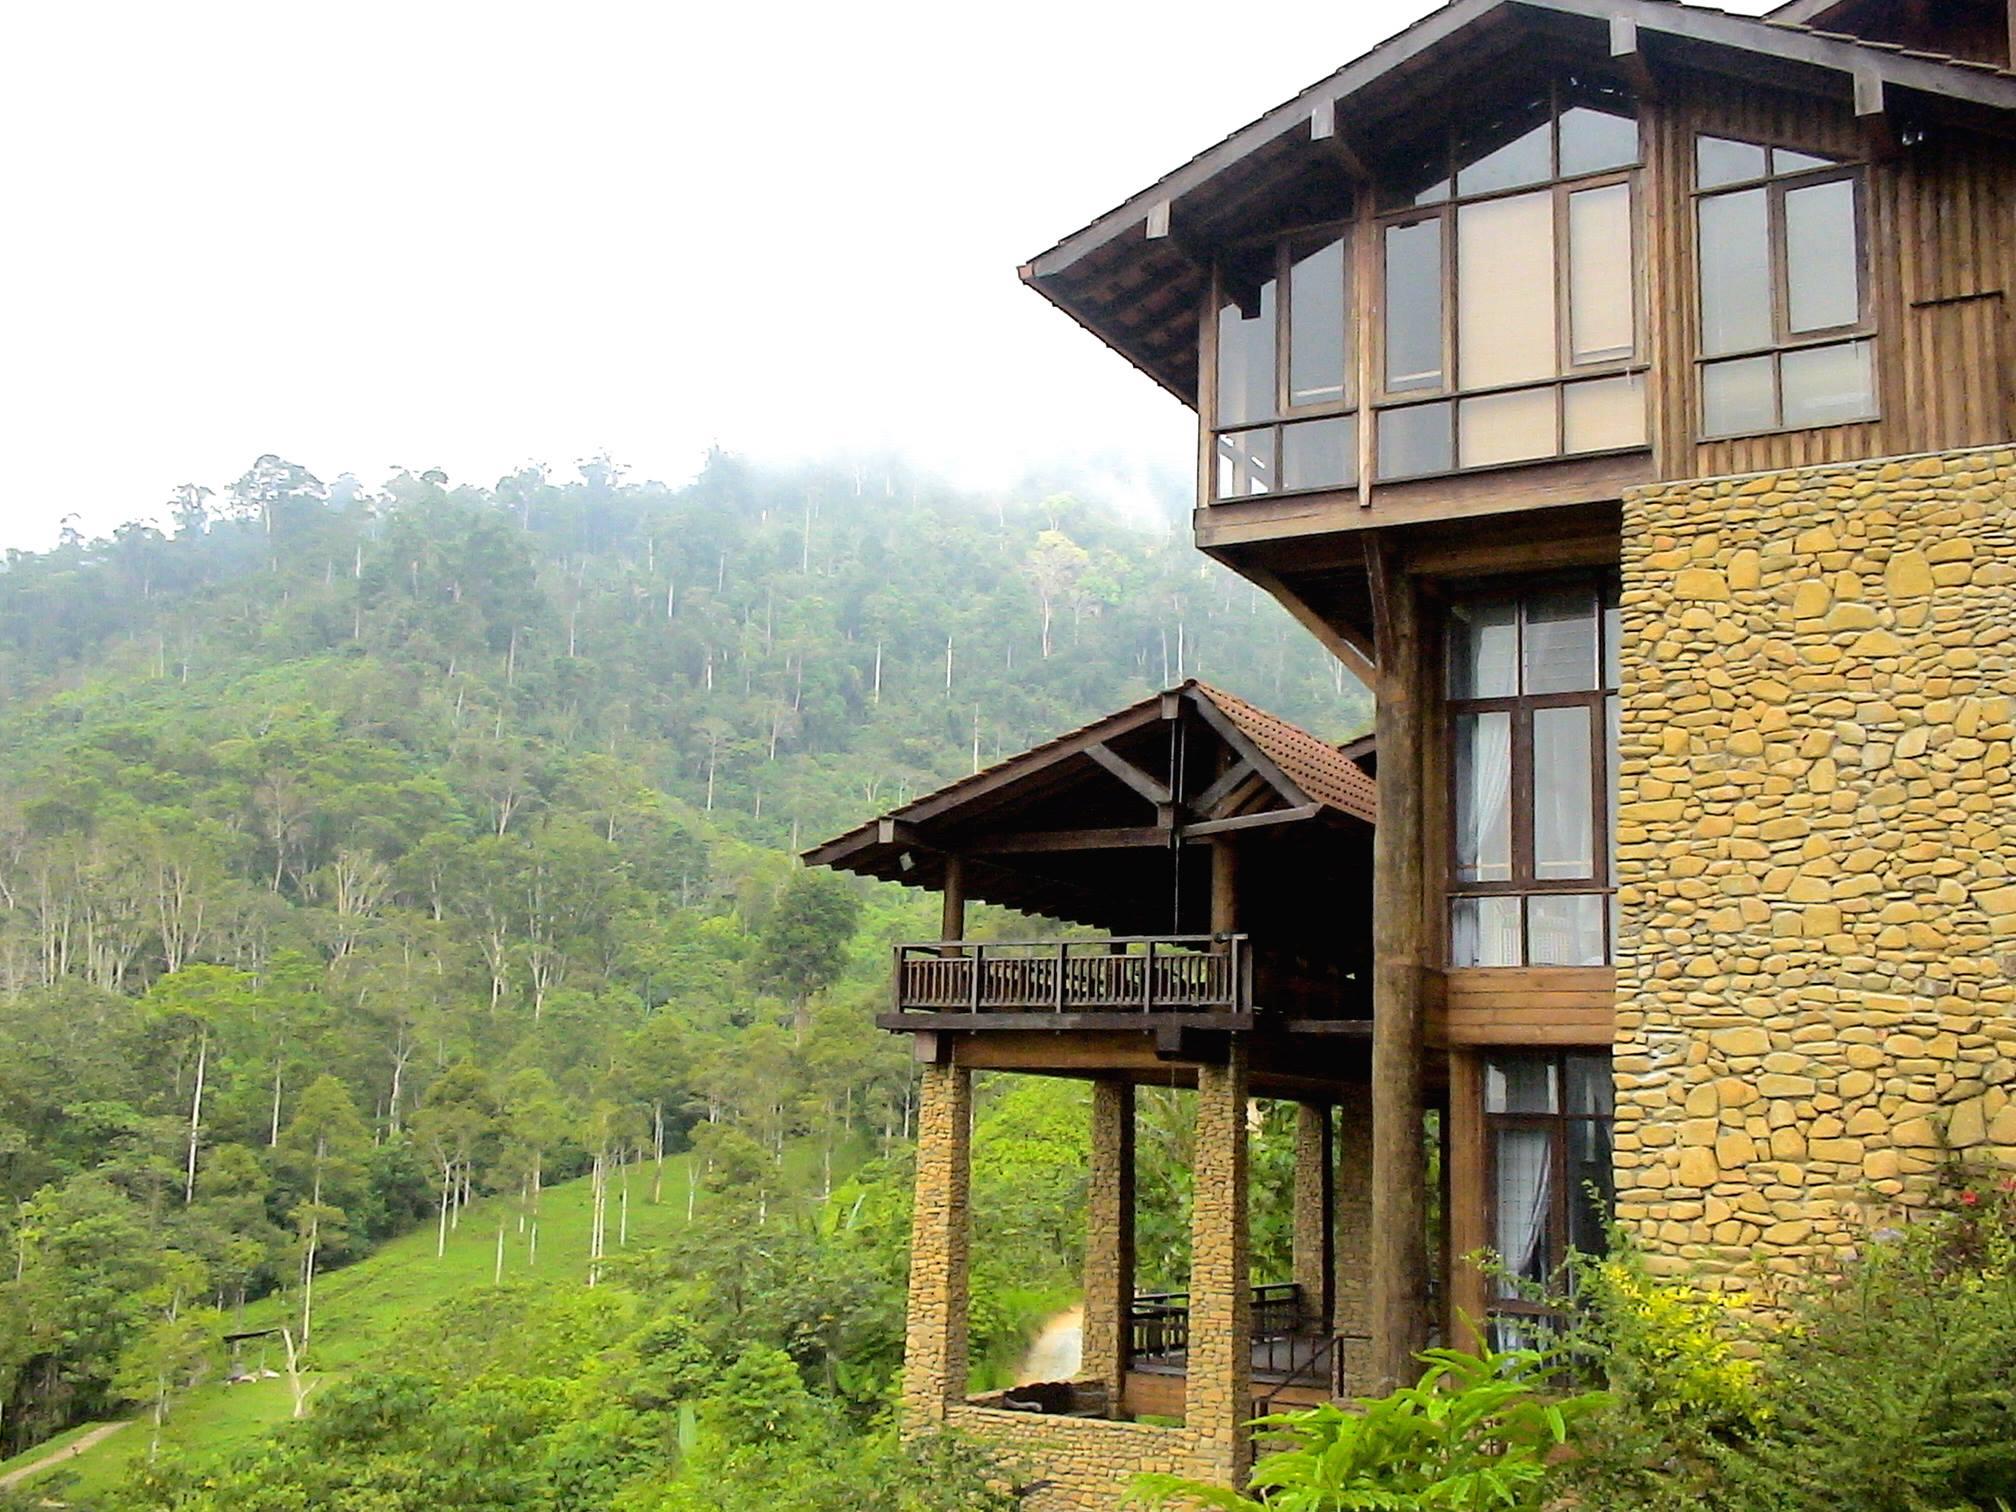 Image from Enderong Resort